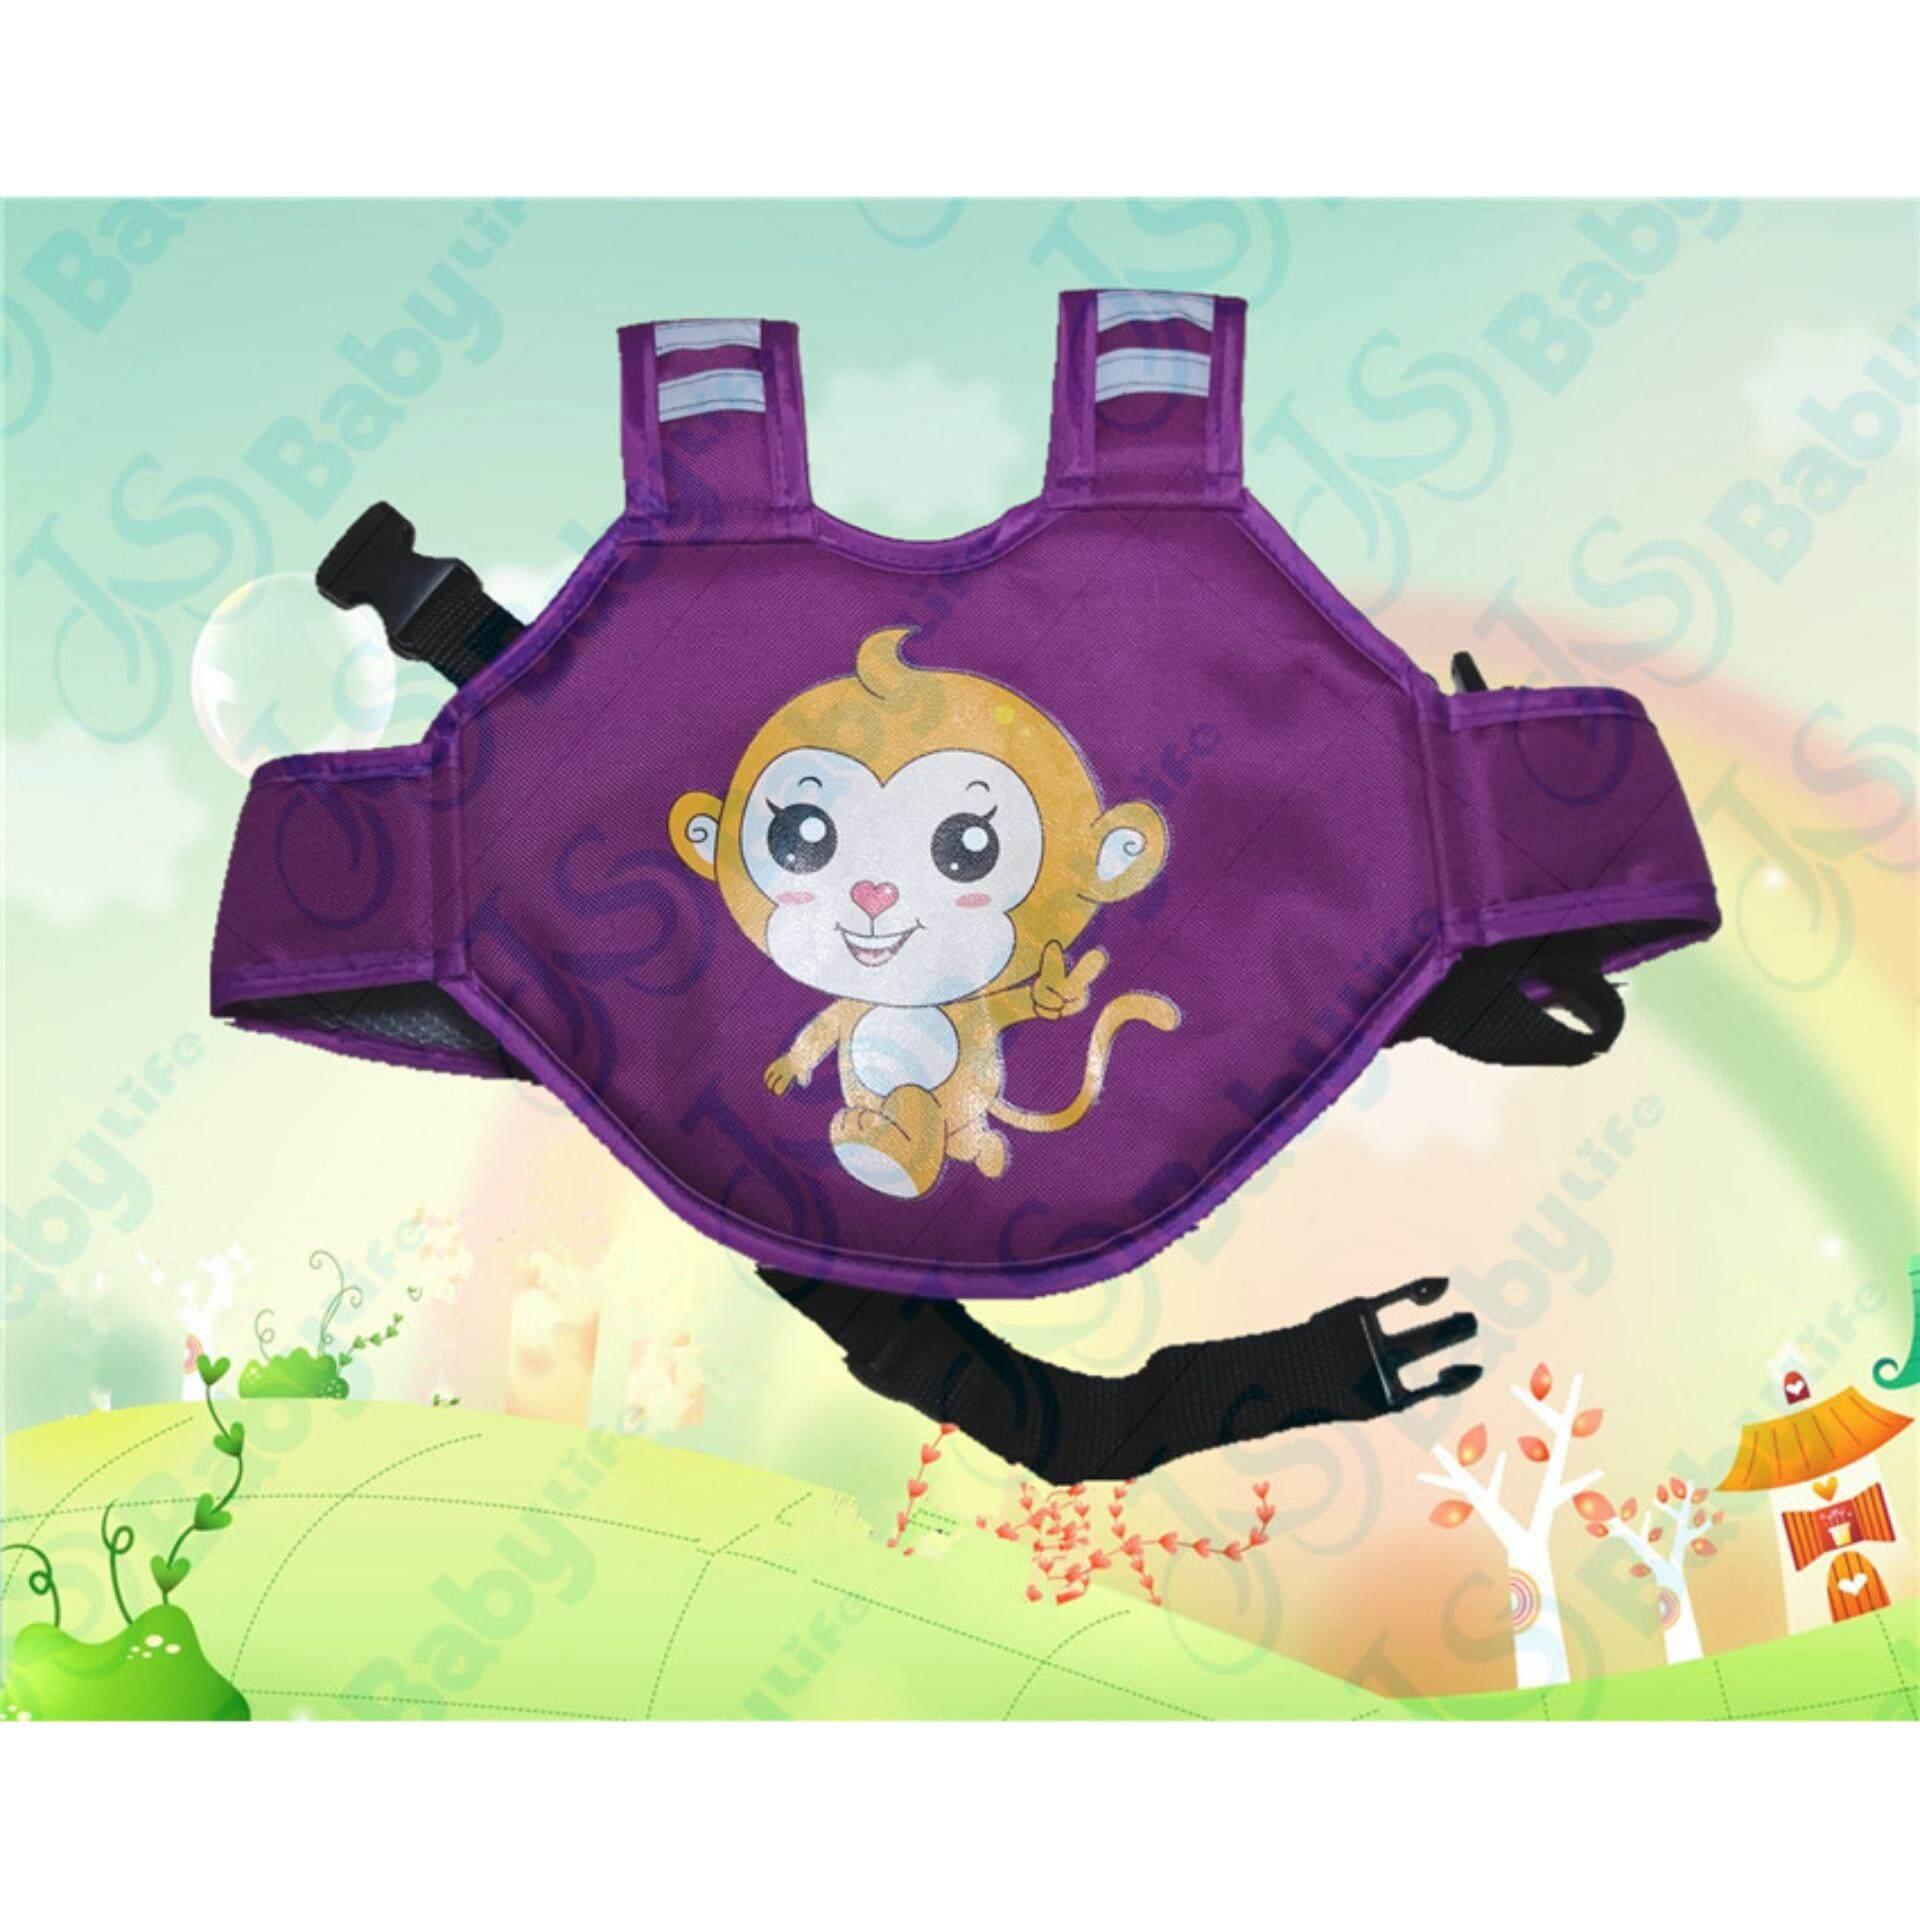 baby life สายรัดนิรภัยกันเด็กตกรถมอเตอร์ไซต์ สำหรับเด็กอายุ 3 - 10 ปี แบบกระเป๋าเป้สะพายหลัง สำหรับขับขี่มอเตอร์ไซต์ รุ่น:D1